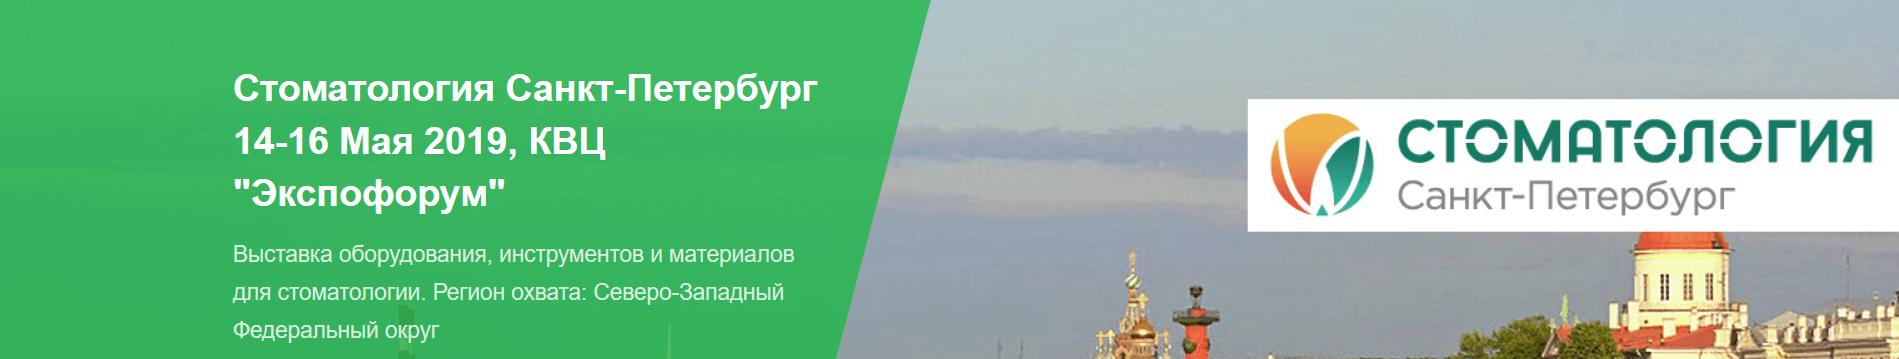 Стоматология Санкт-Петербург 2019